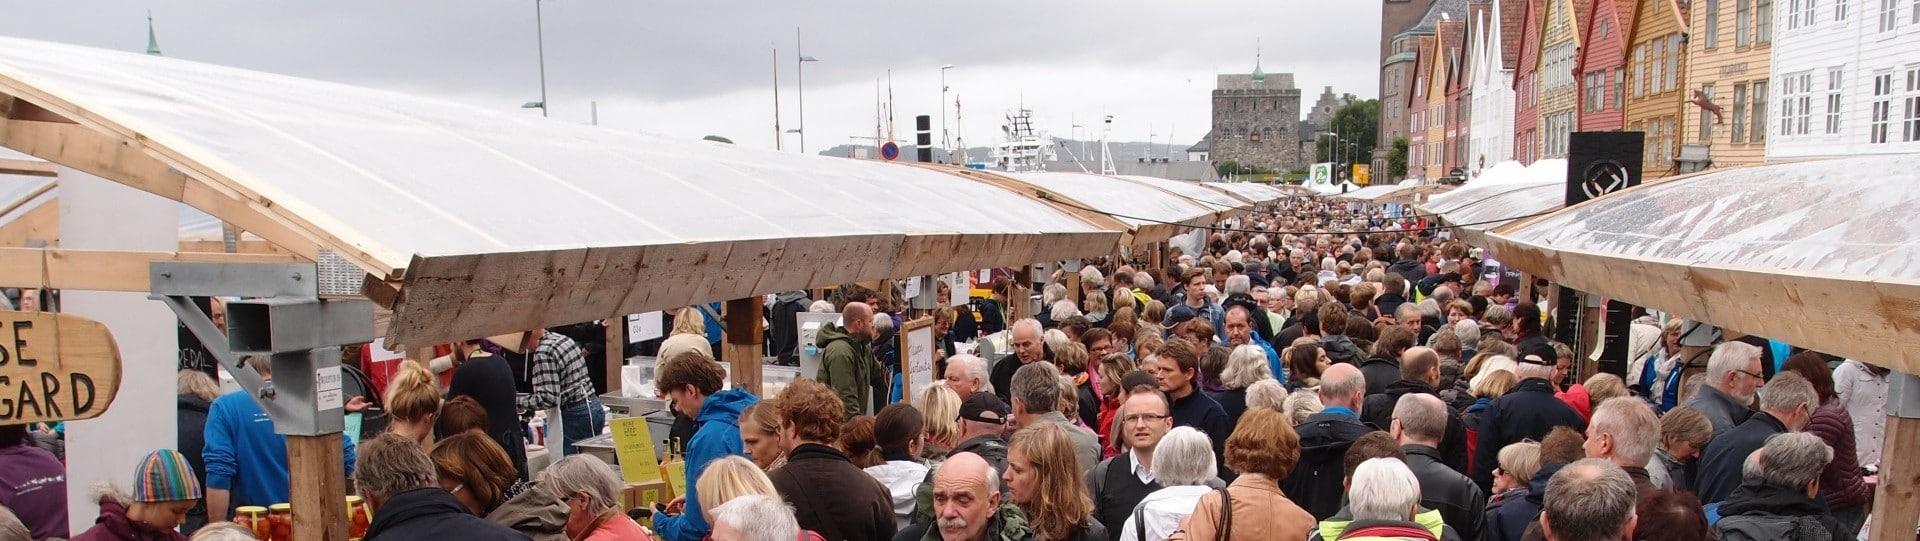 Bergen Matfestival 2013